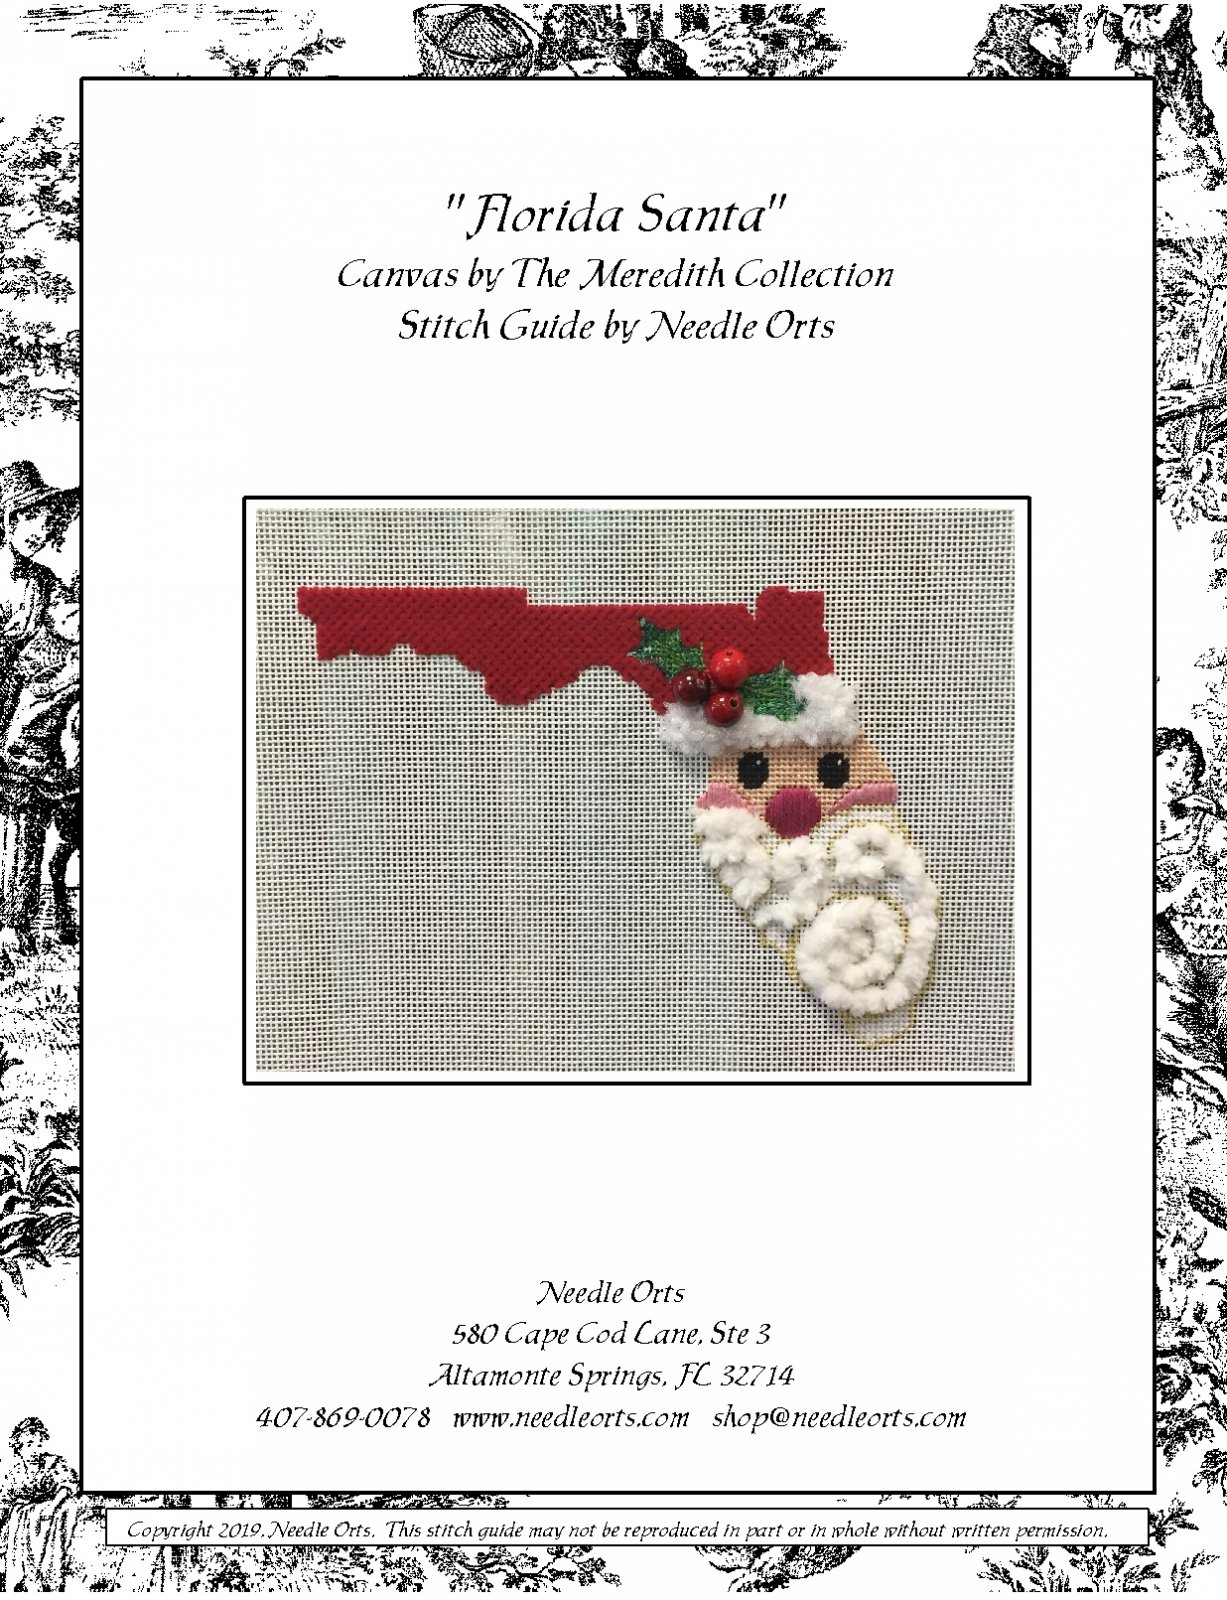 Florida Santa Stitch Guide